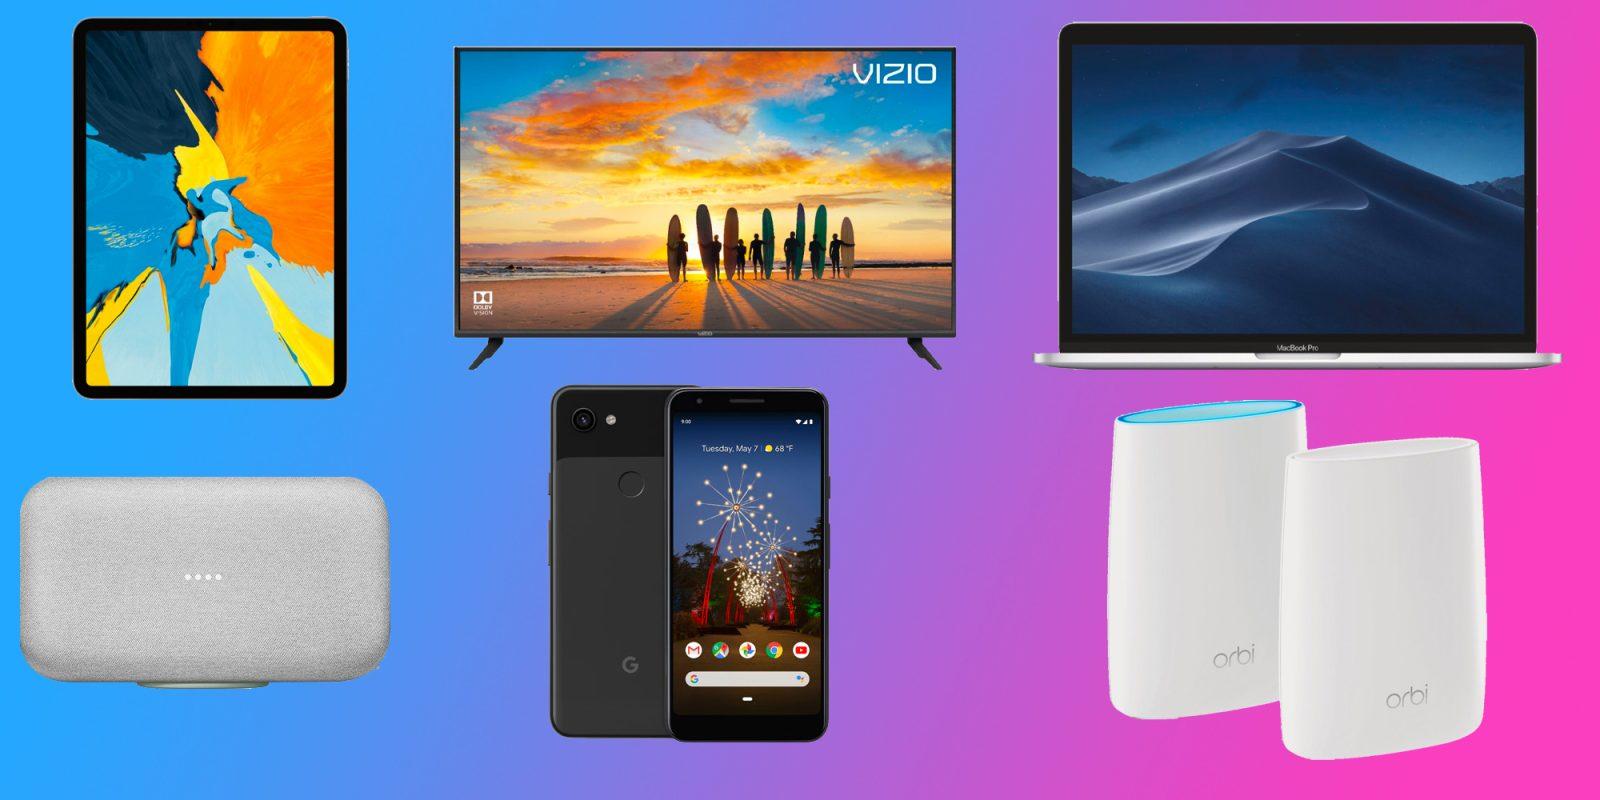 bca19d5de09 Best July 4th Deals: Save on Apple, Google speakers + phones, smart home,  more